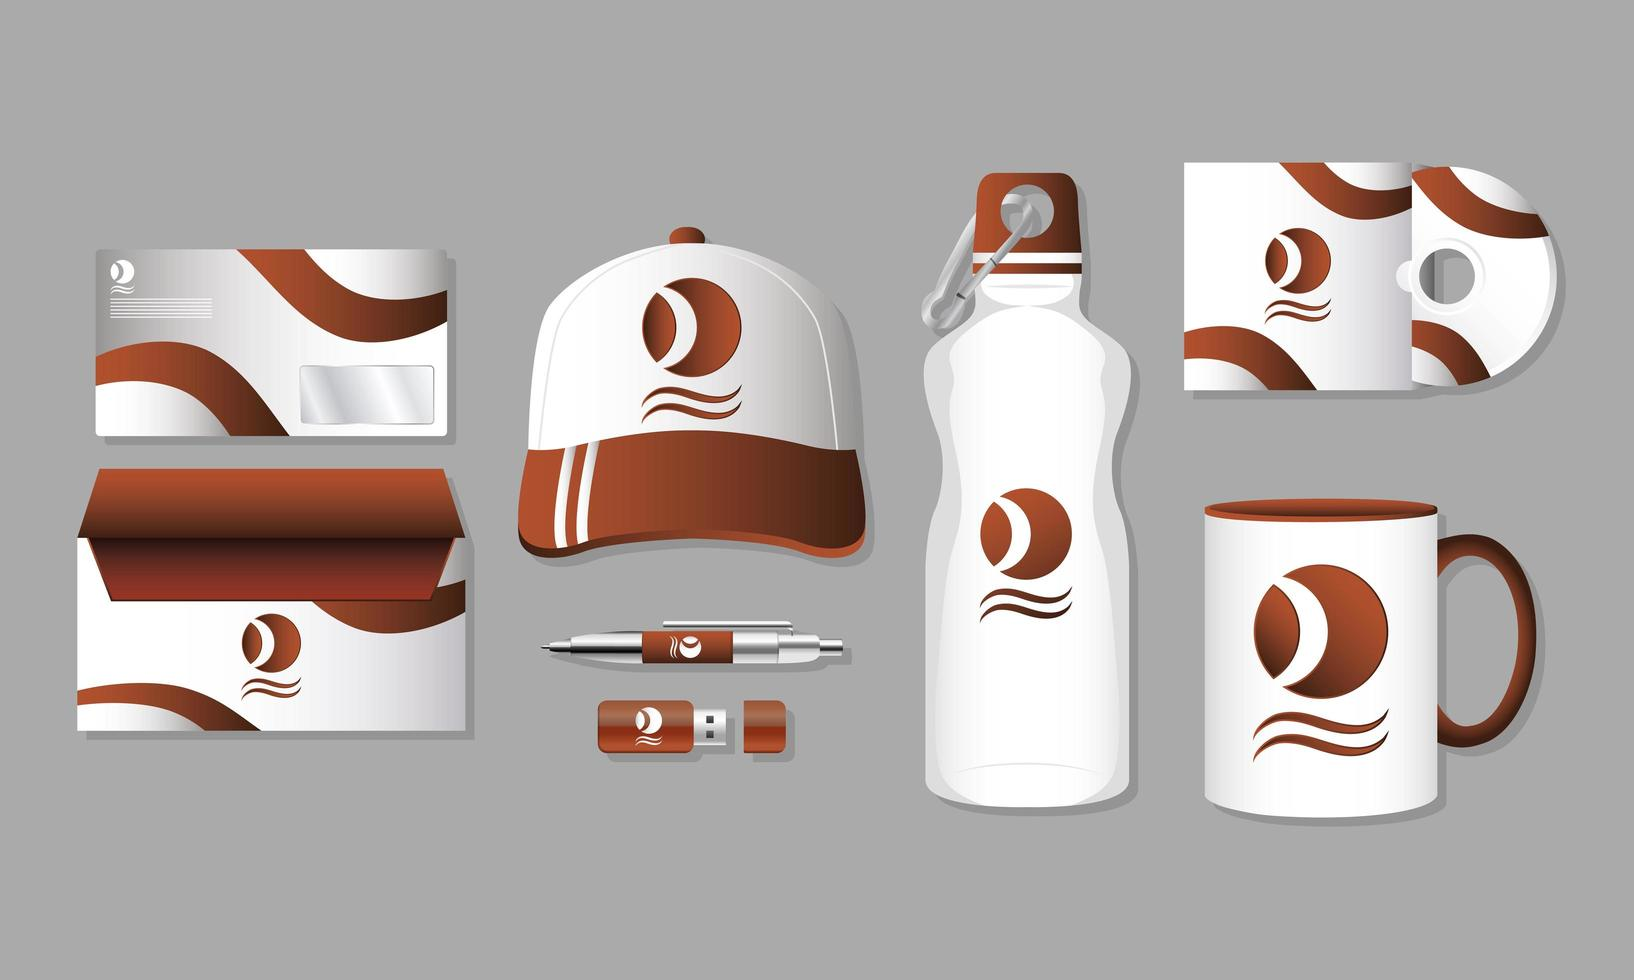 Branding and marketing mock-up set vector